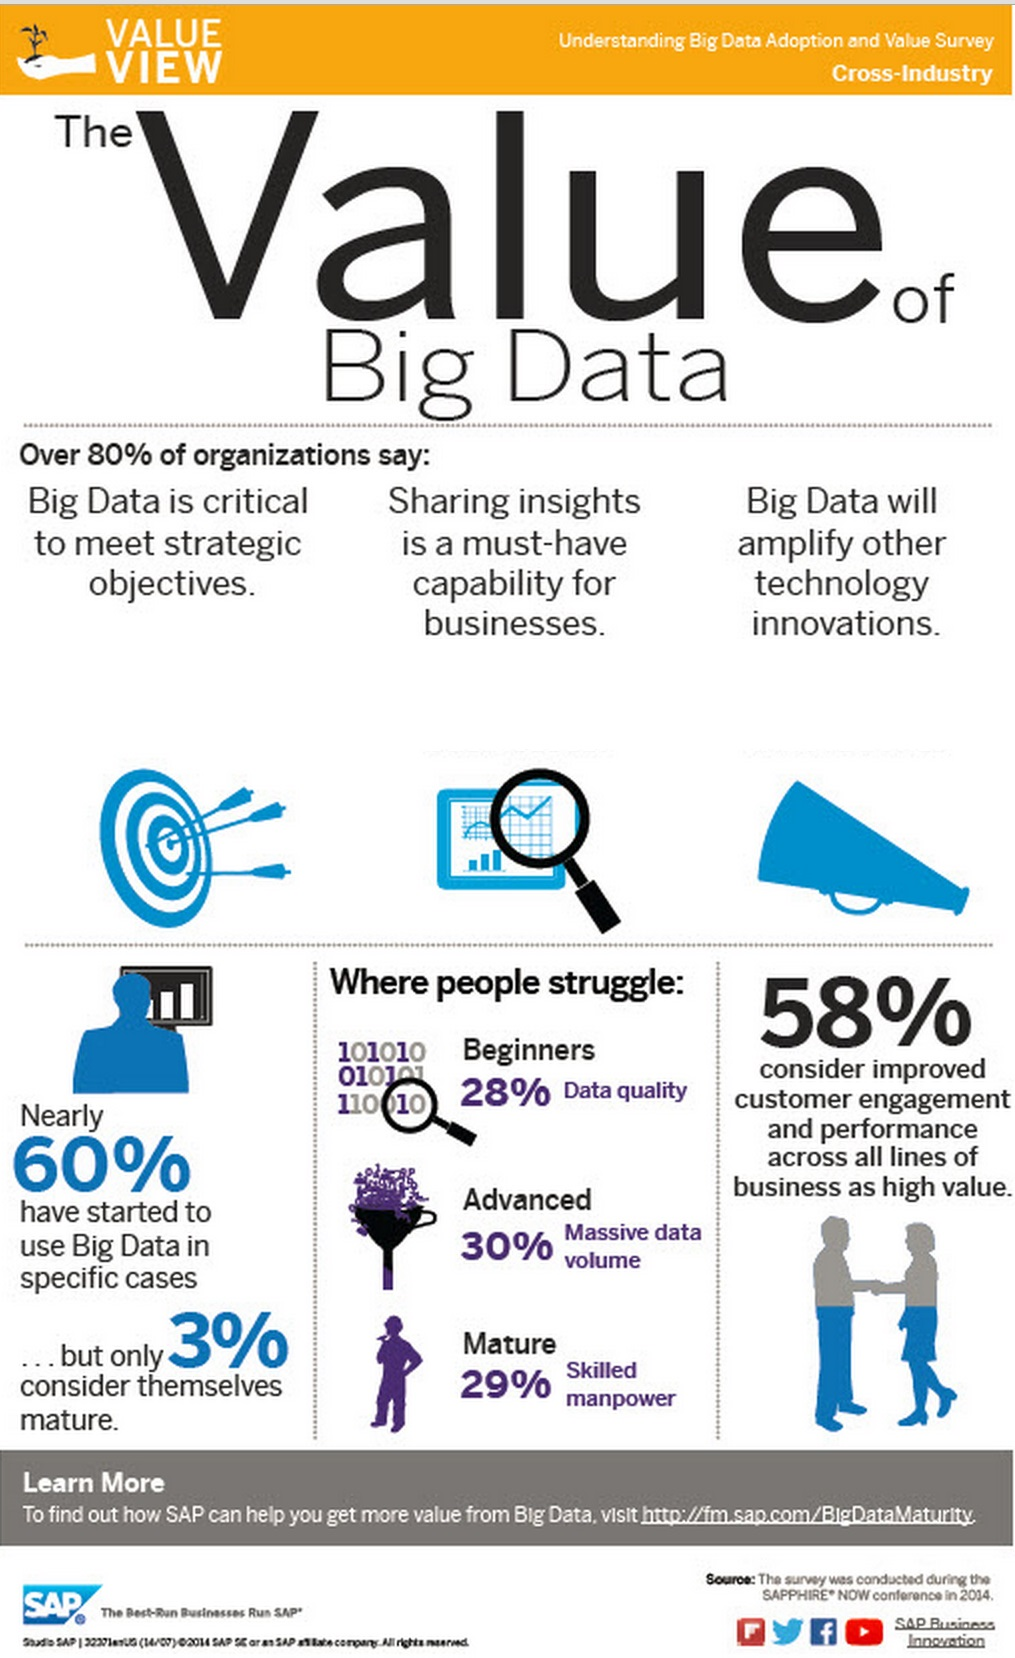 Value of Big Data